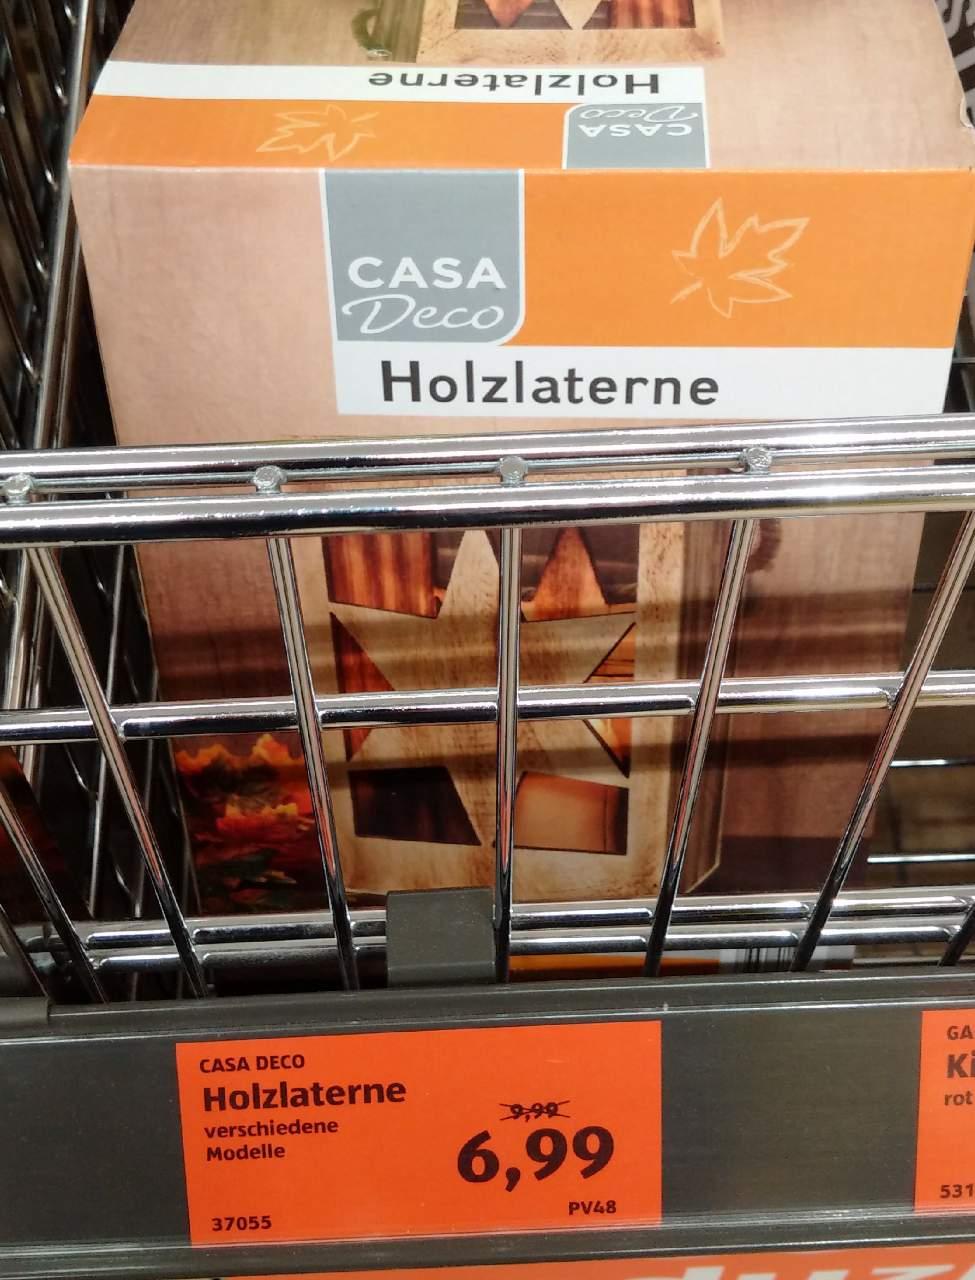 CASA Deco Holzlaterne - jetzt 30% billiger